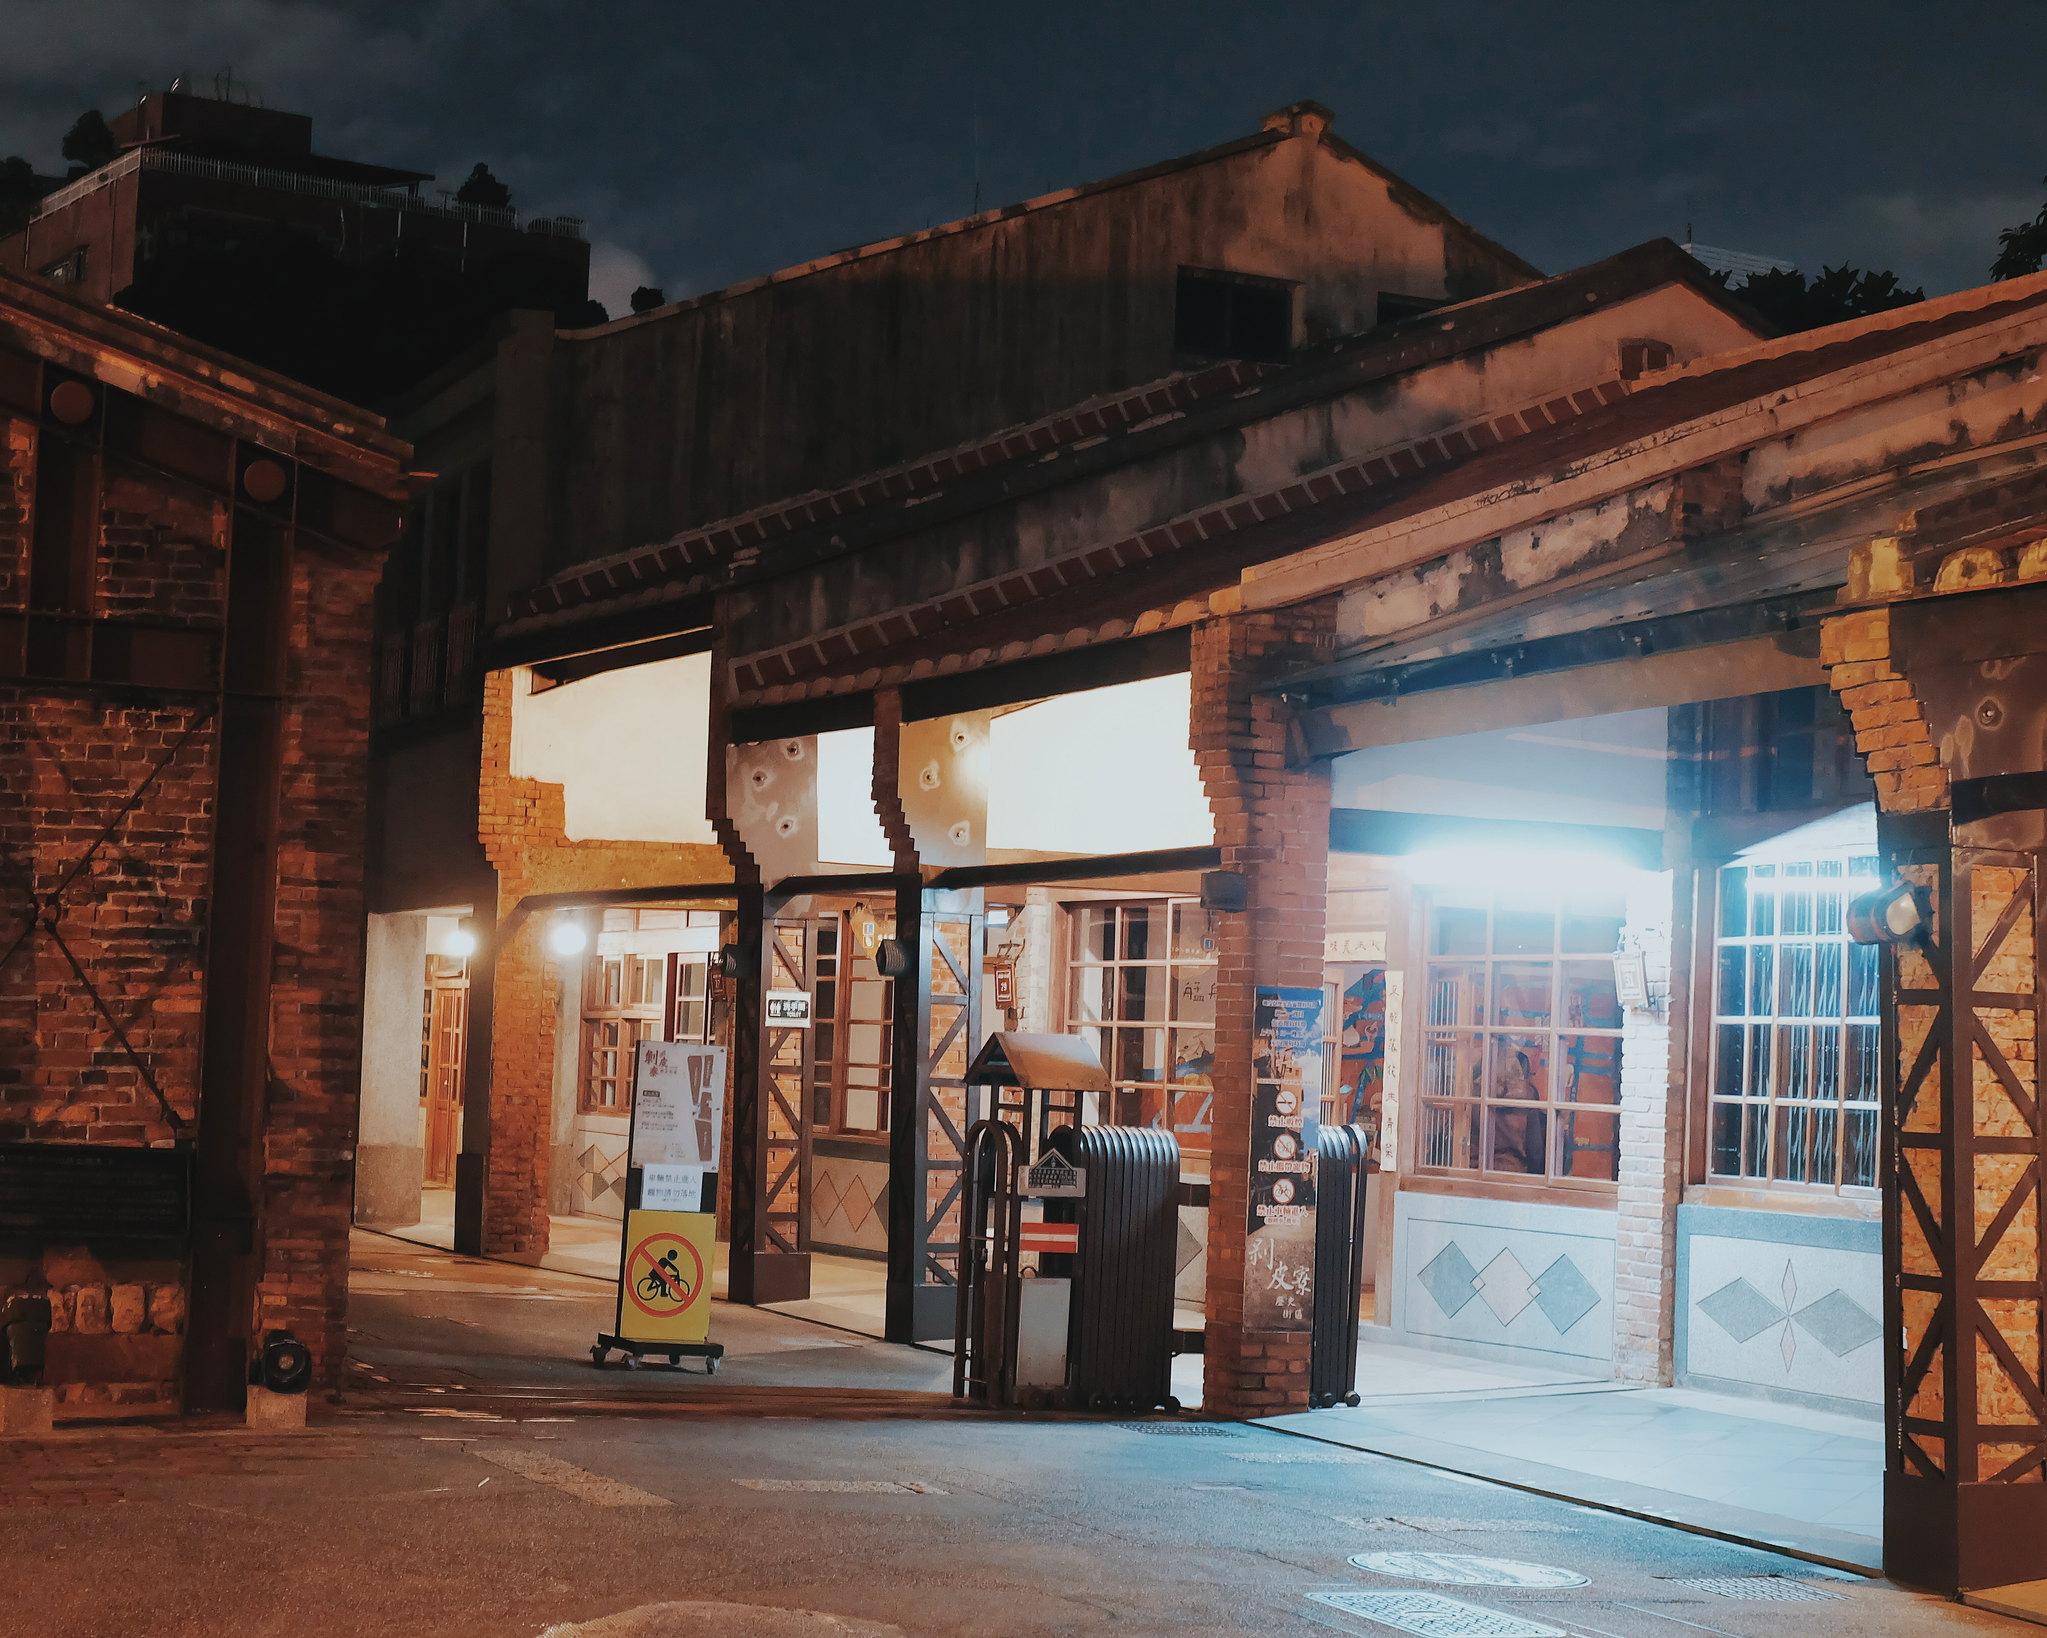 Bopiliao Old Street blog